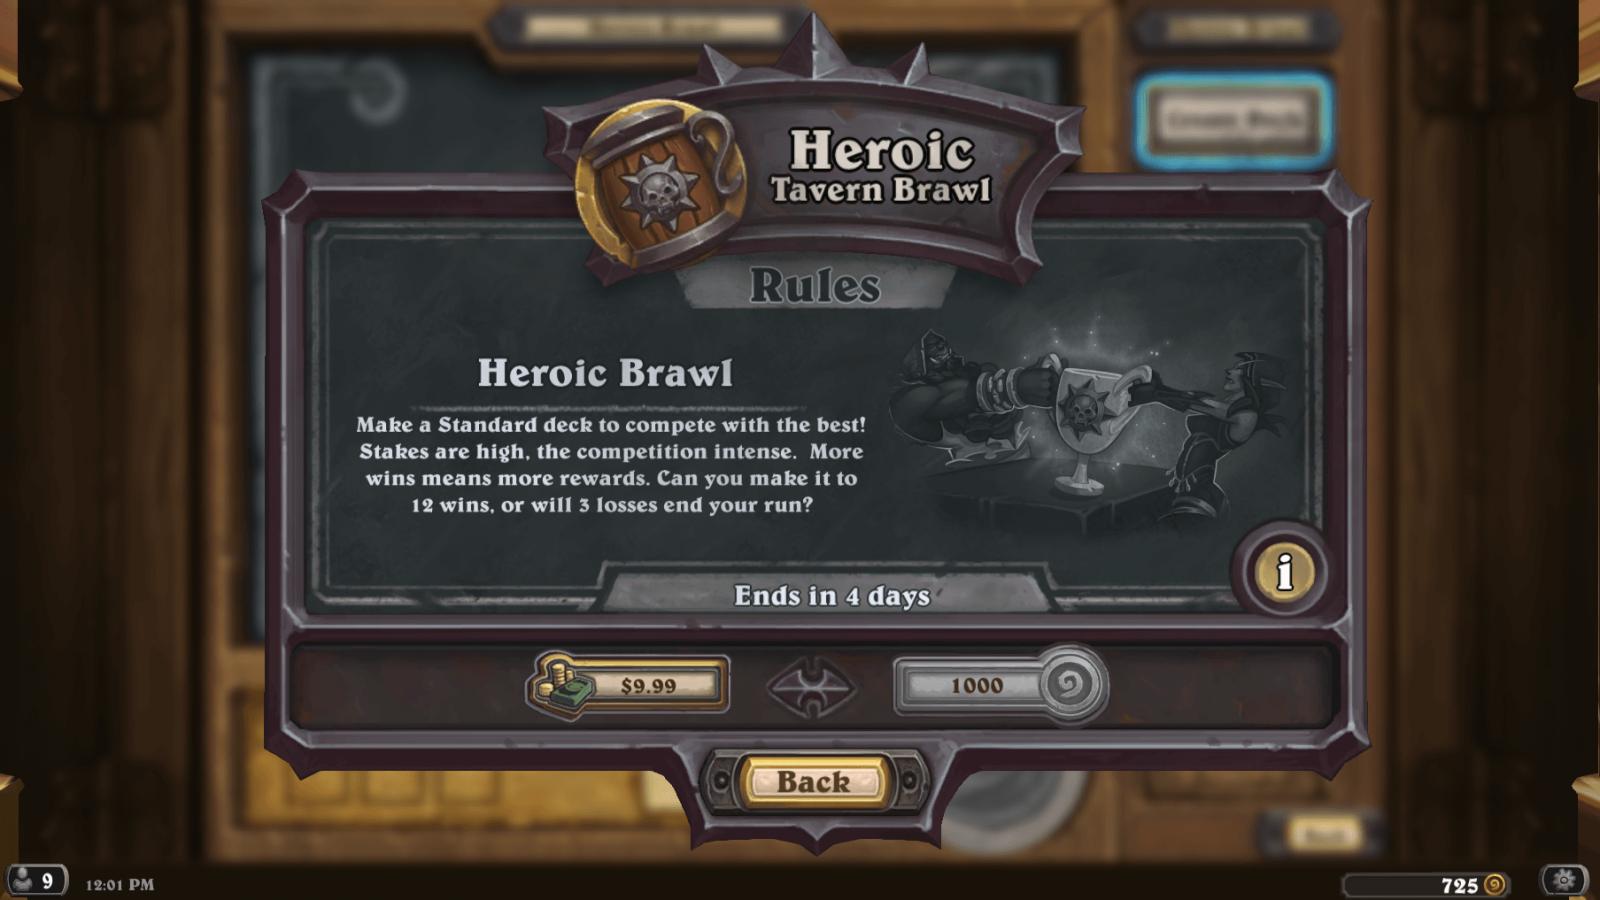 Heroic Brawl